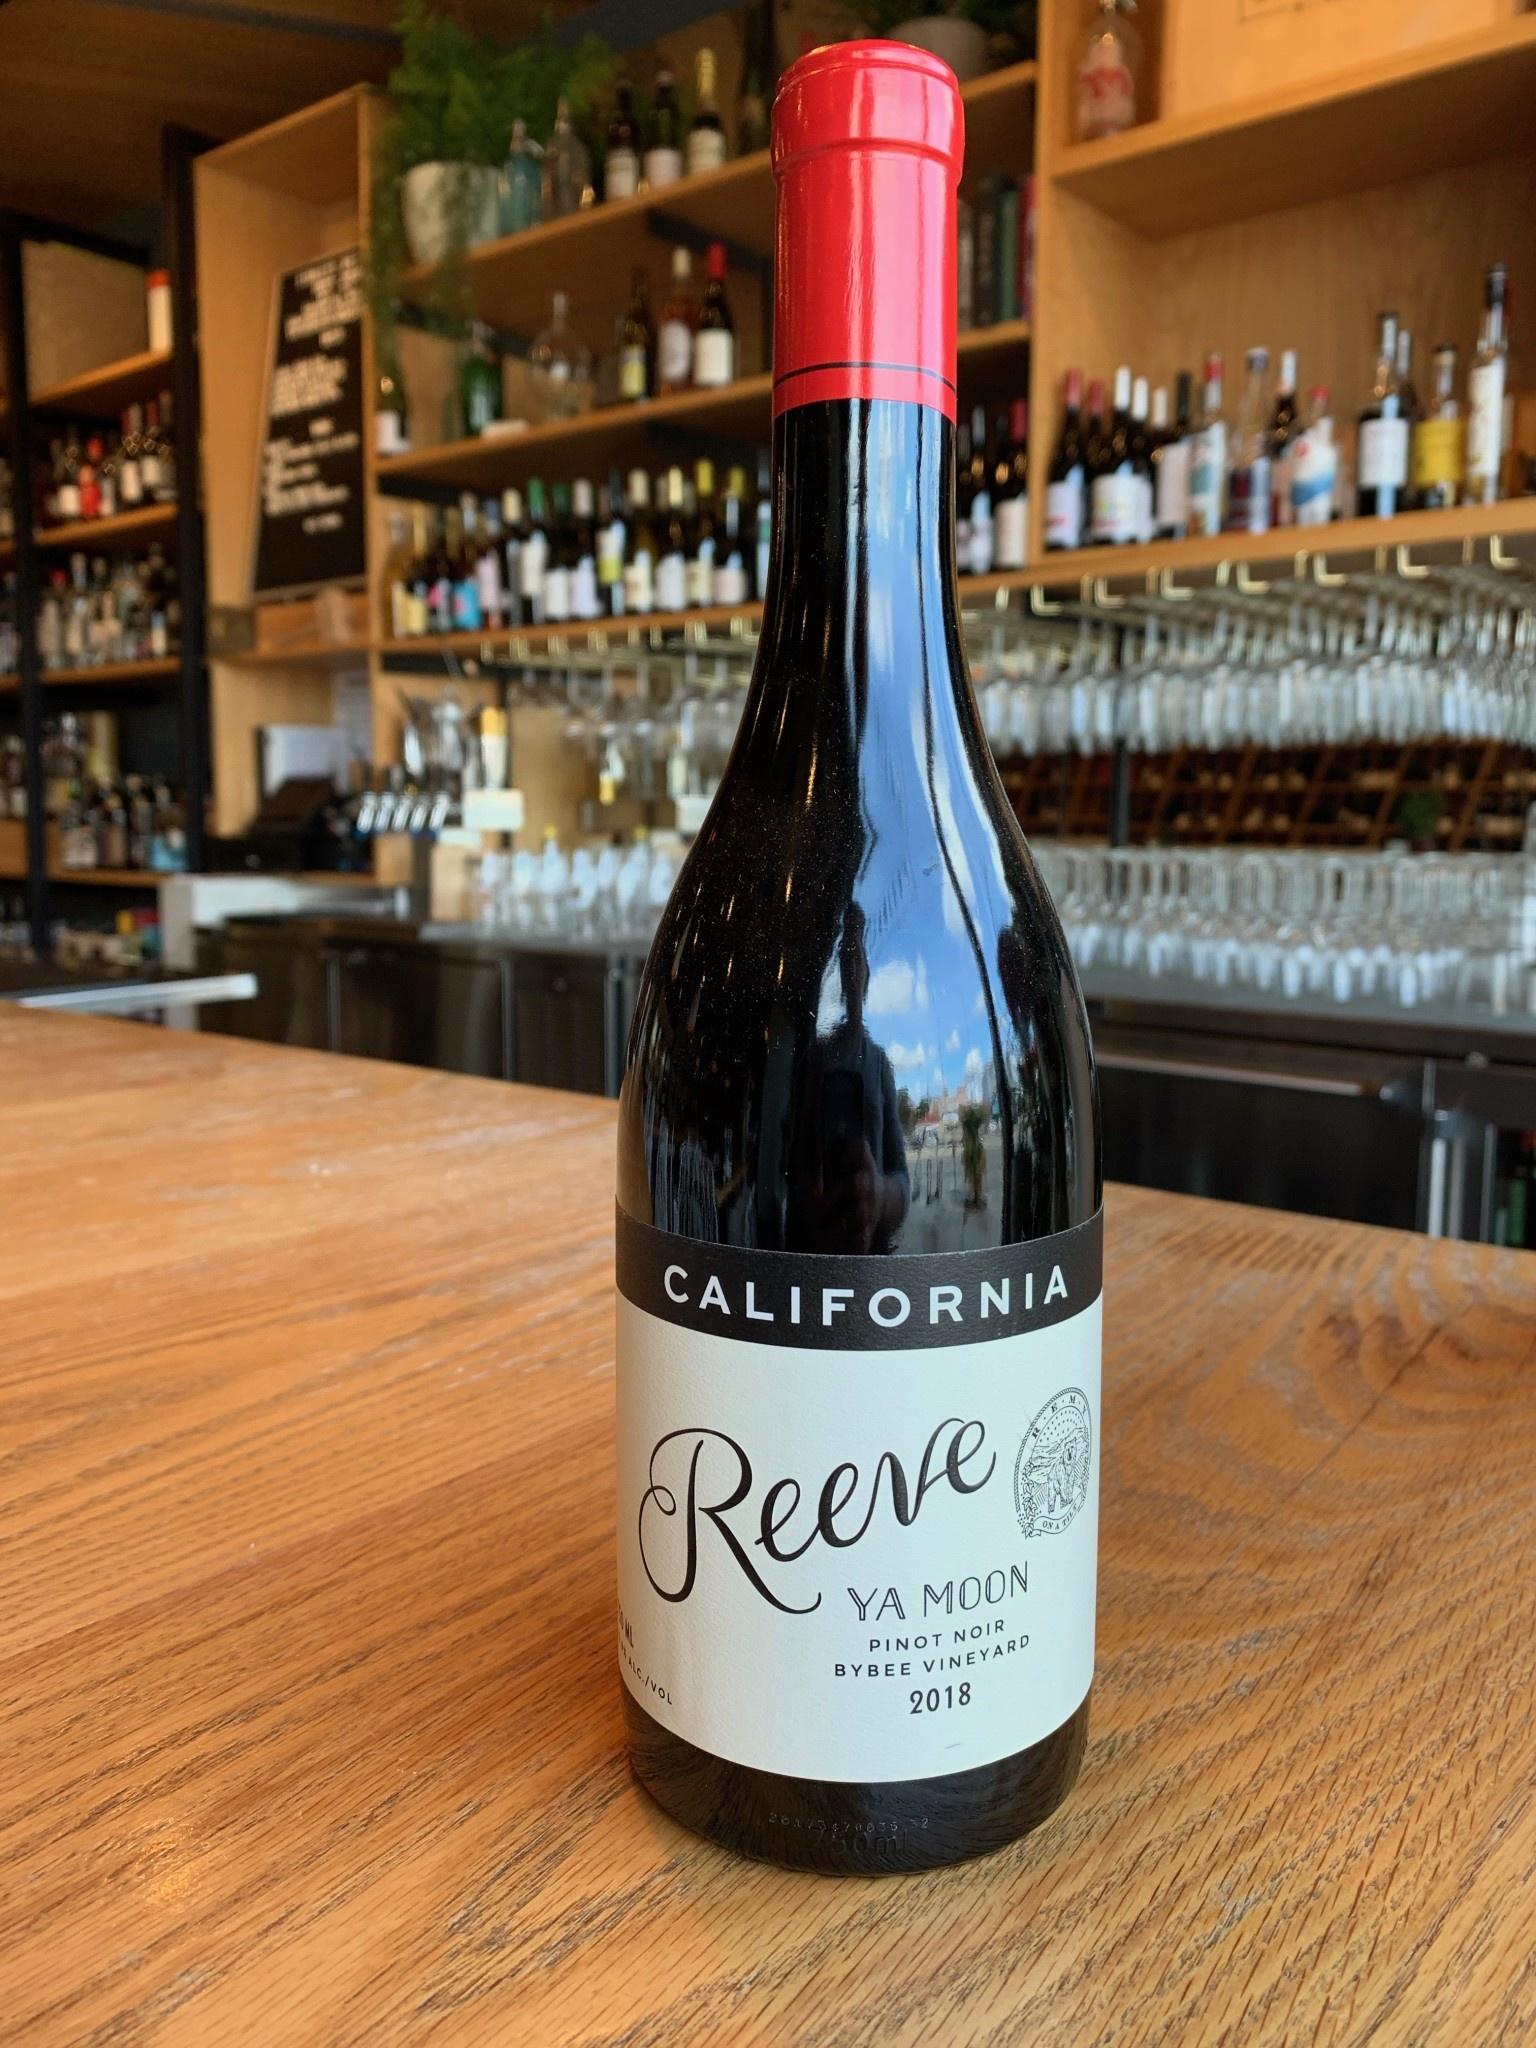 2018 Reeve Ya Moon' Pinot Noir, Bybee Vineyard, Sonoma Coast 750ml